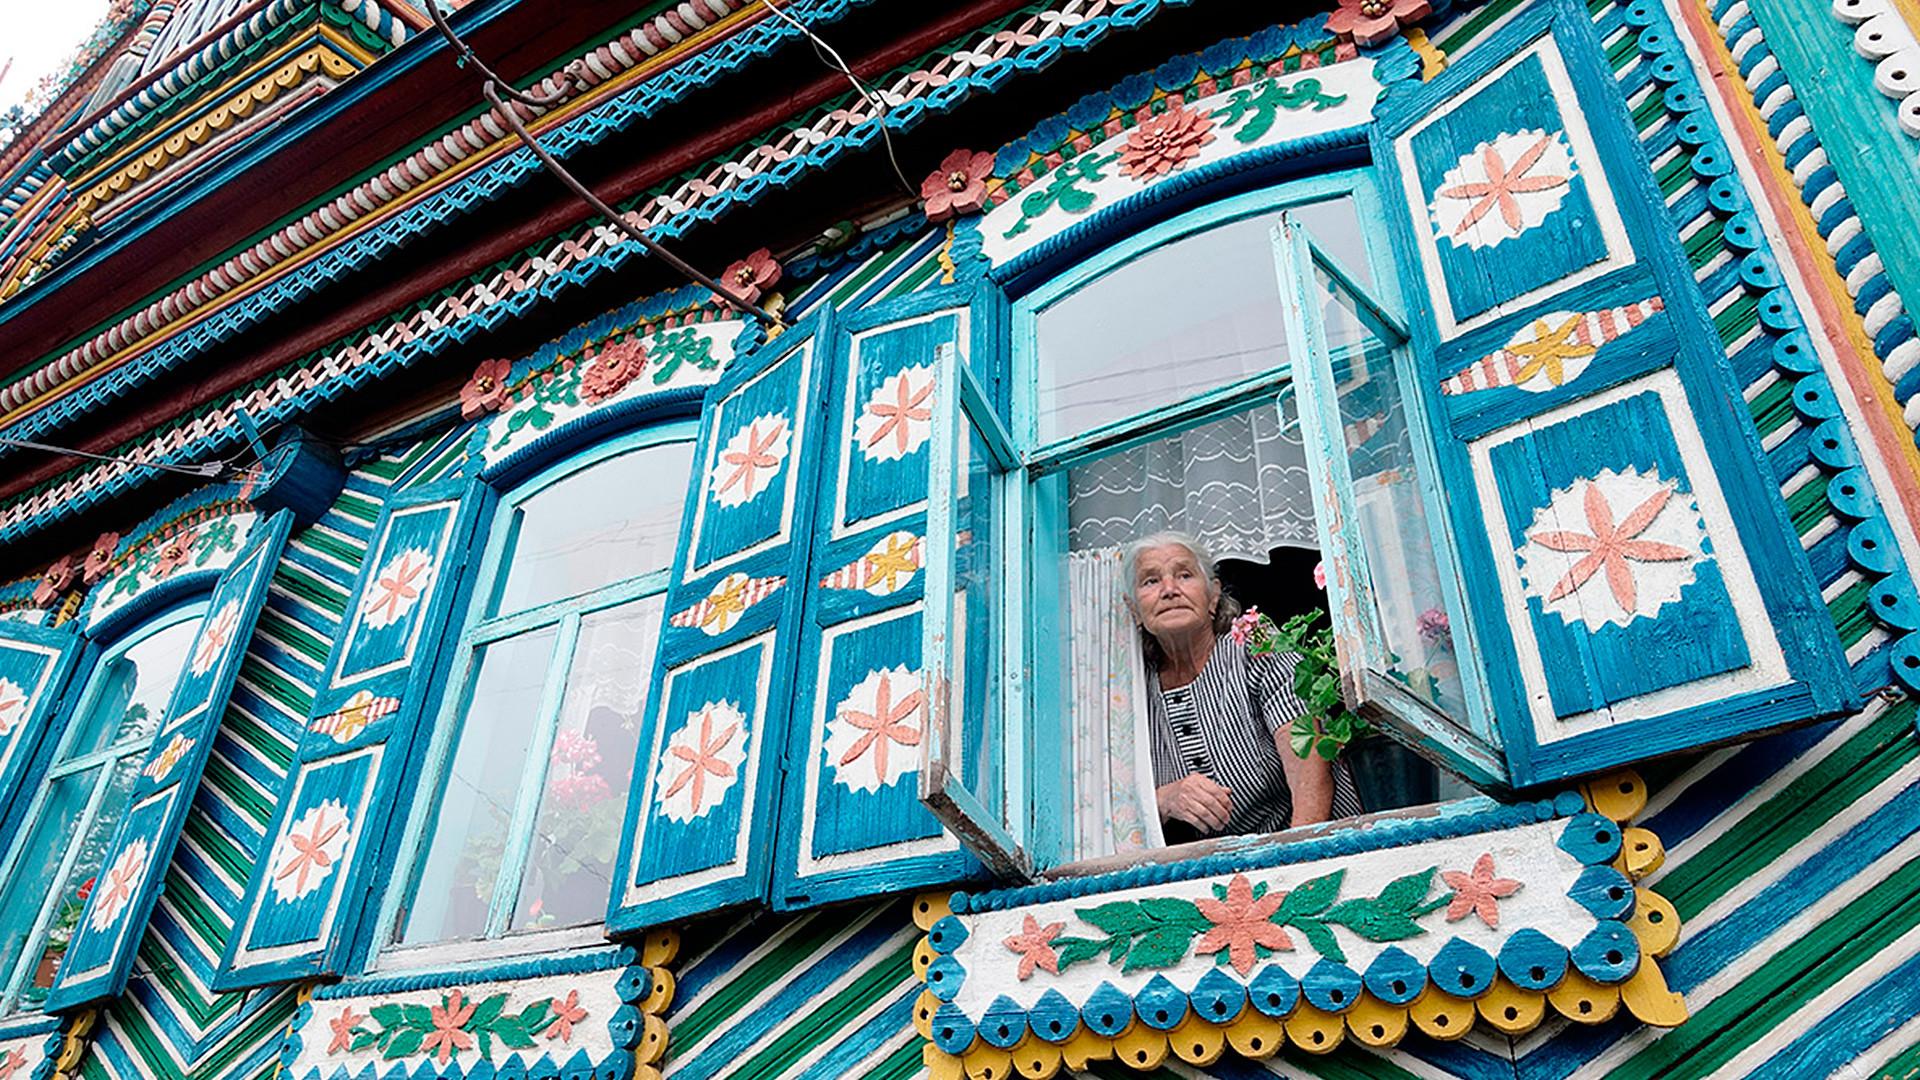 Дом кузнеца Кириллова в деревне Кунара Свердловской области.